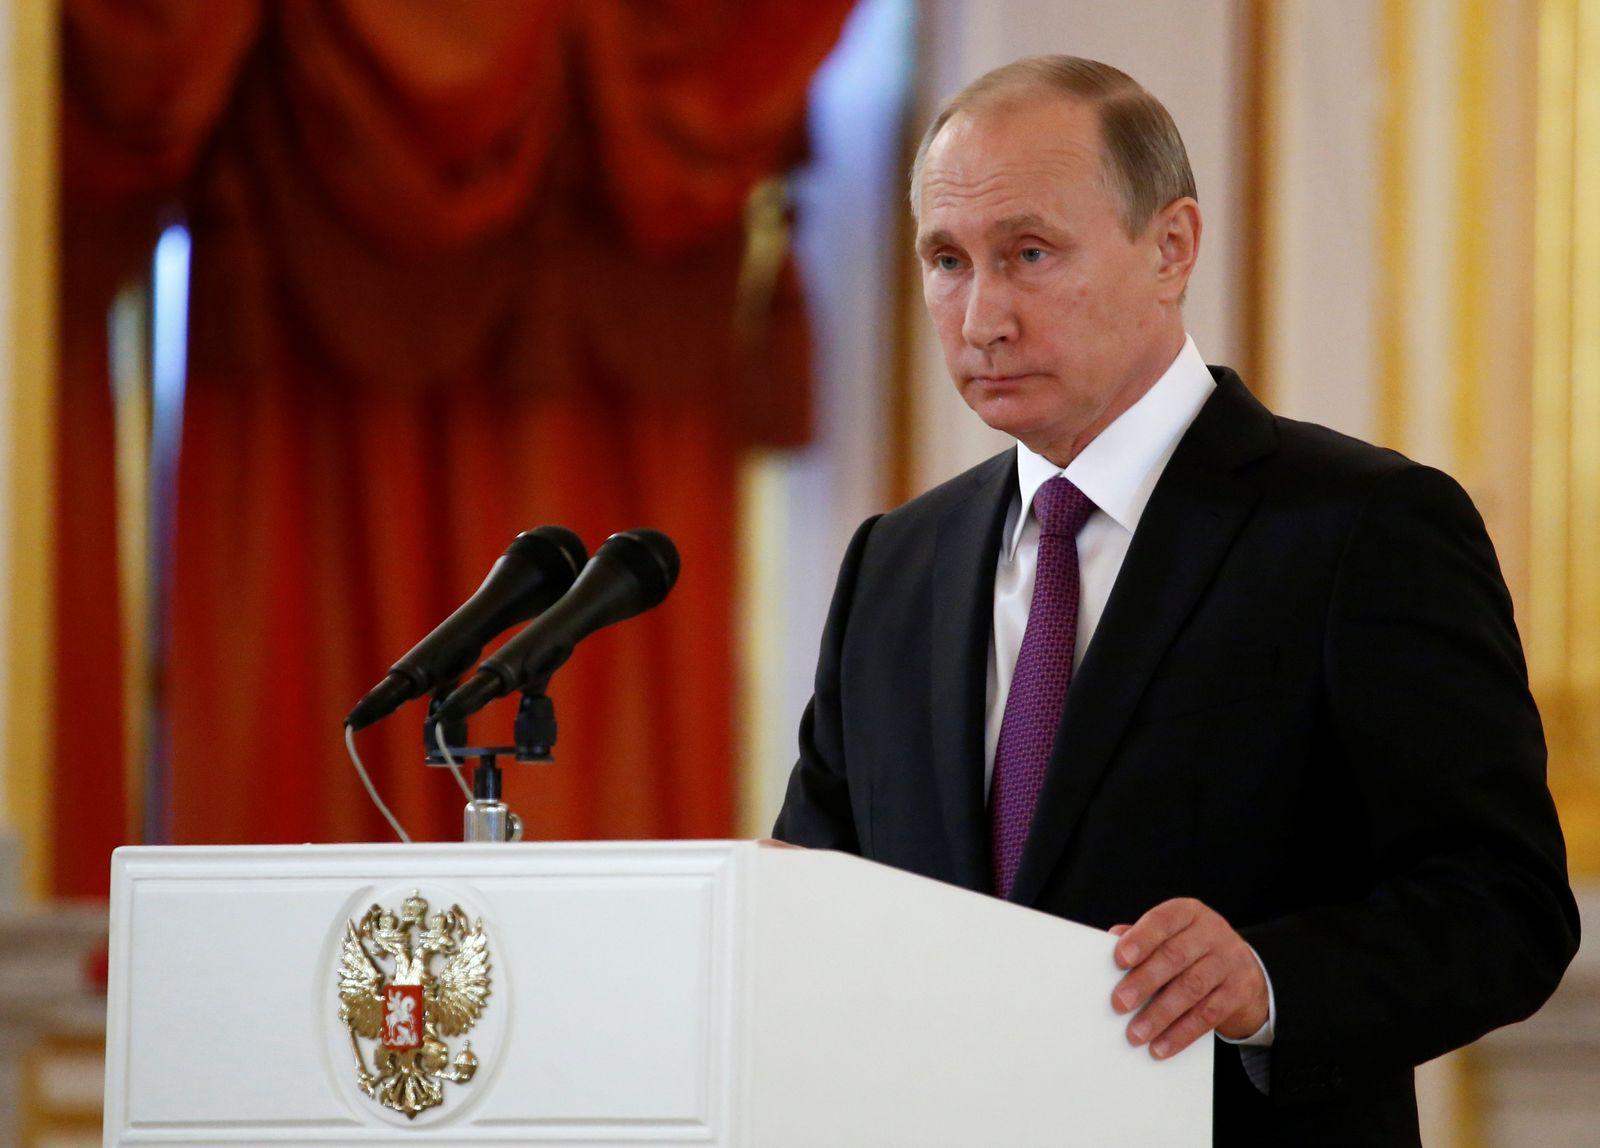 Putin Trump Wahl Reaktion